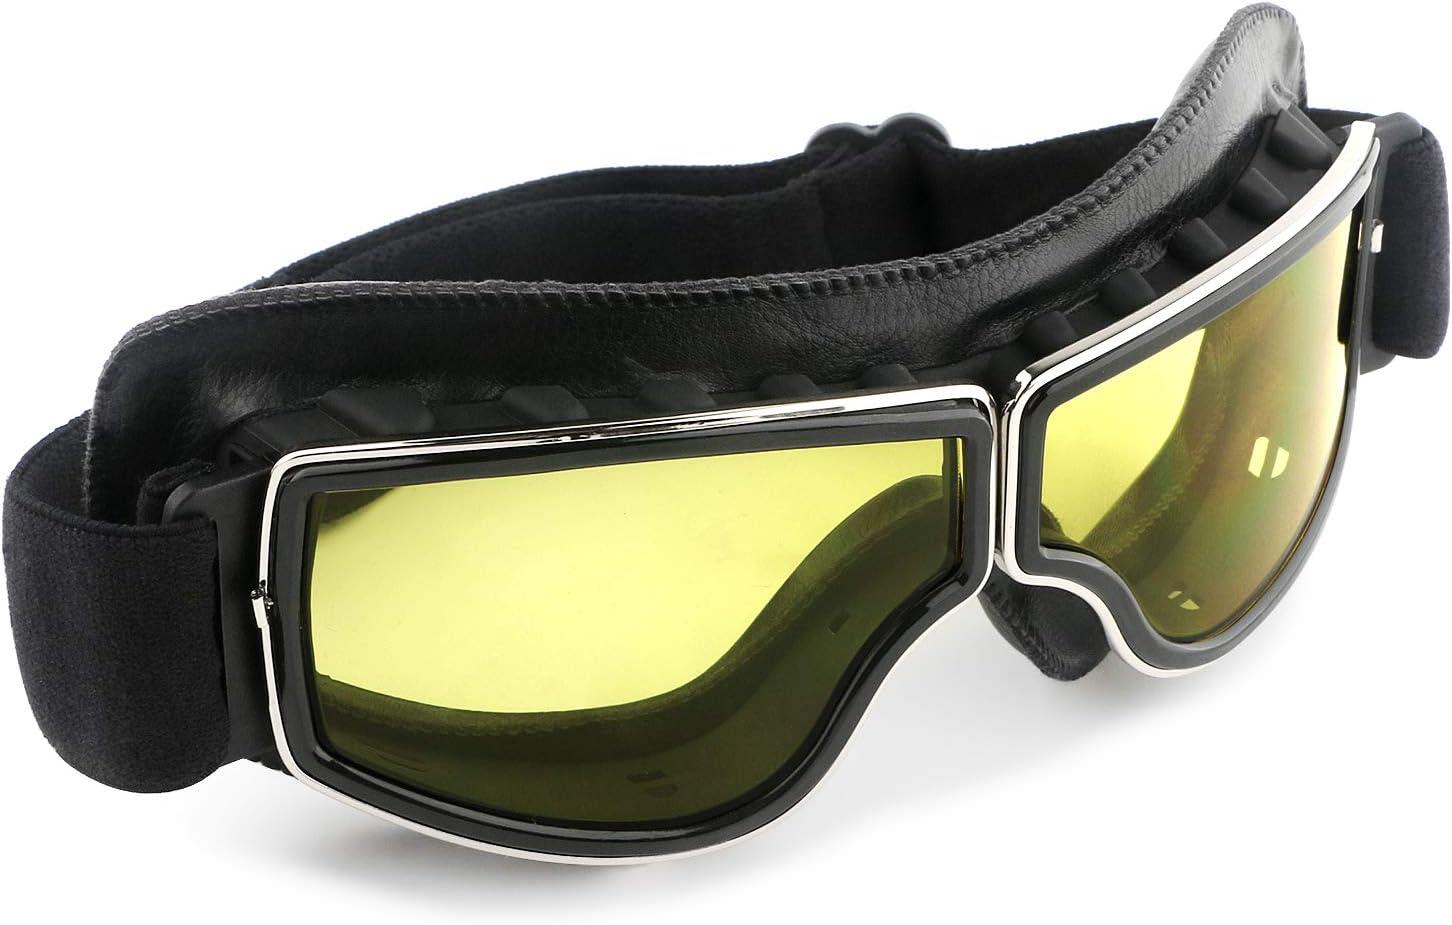 GGBuy Motorcycle Goggles Vintage Anti Fog Pilot PU Leather Glasses Dustproof ATV Off Road Motorbike Helmet Eyewear Protect for Ridding Motorcross Classes Aviator Goggles